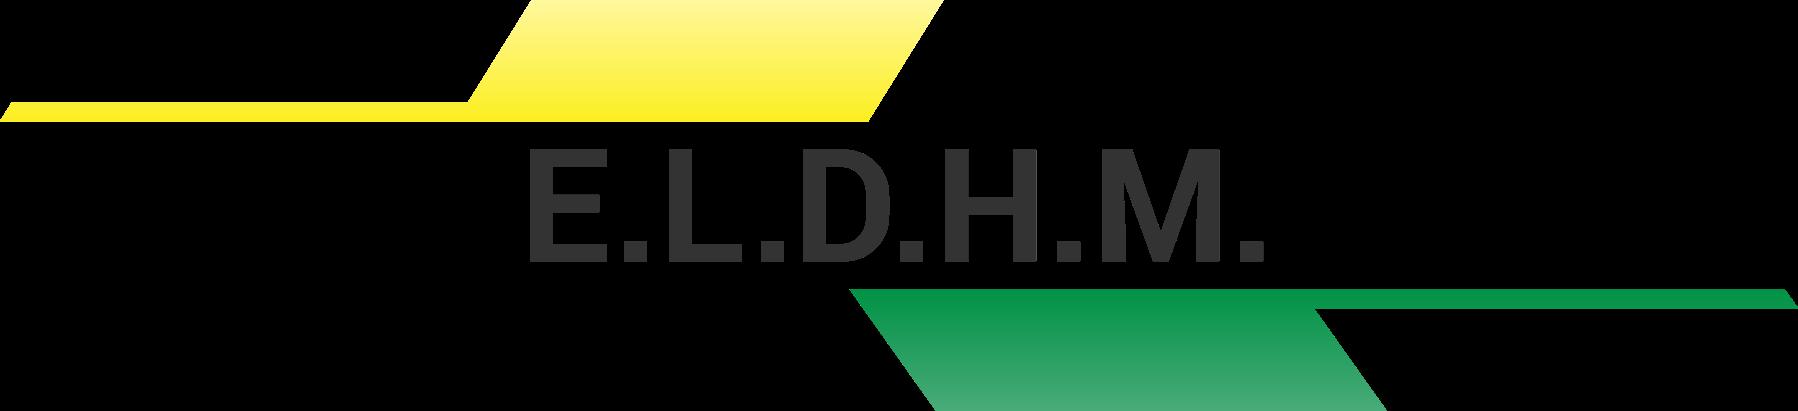 E.L.D.H.M. - Bauunterehmen aus Mannheim nähe Heidelberg